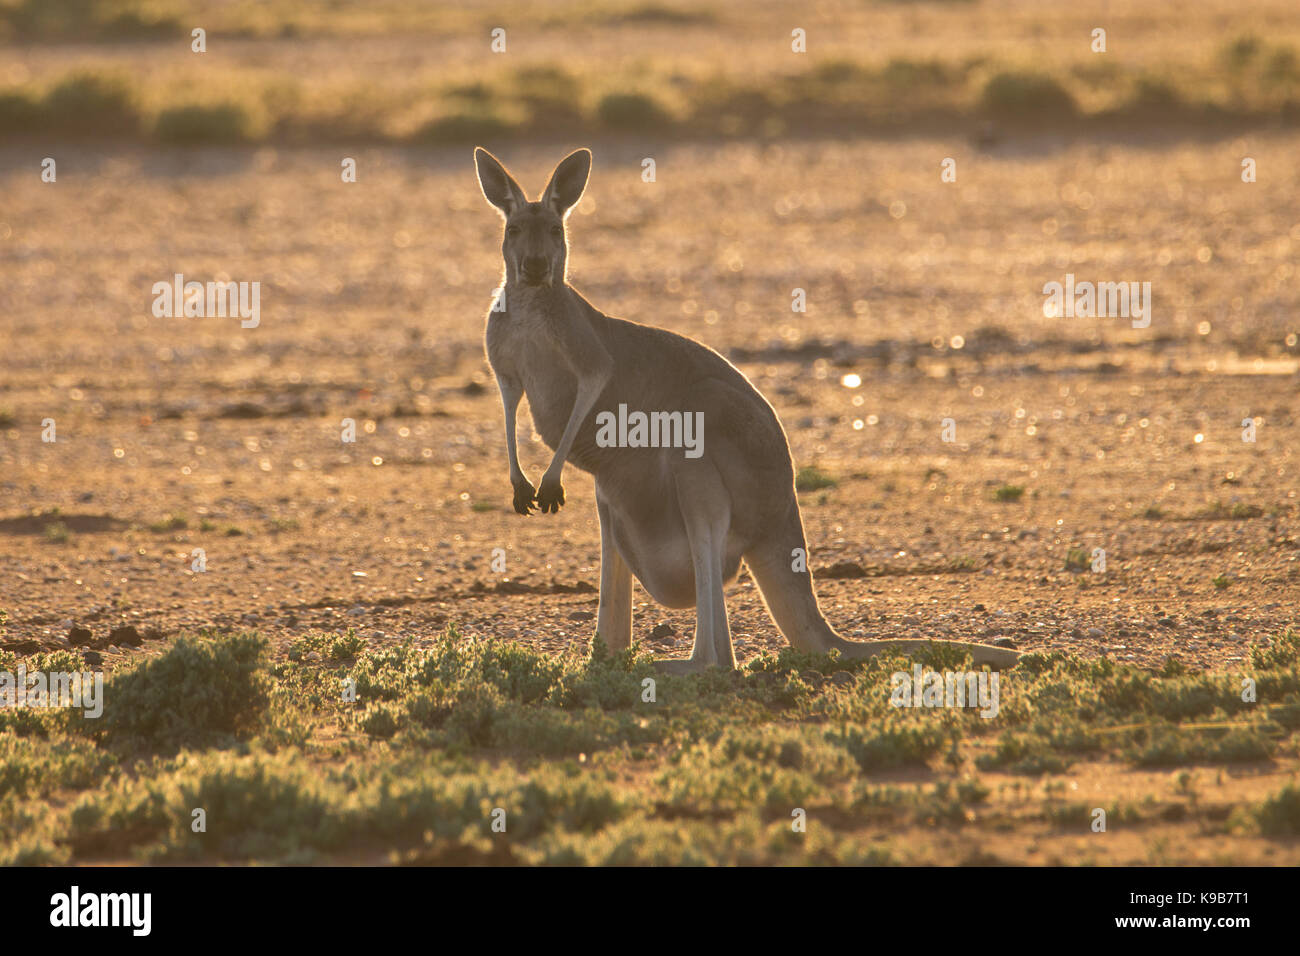 Female Red Kangaroo (Macropus rufus) in warm late afternoon light, Sturt National Park, outback NSW, Australia - Stock Image